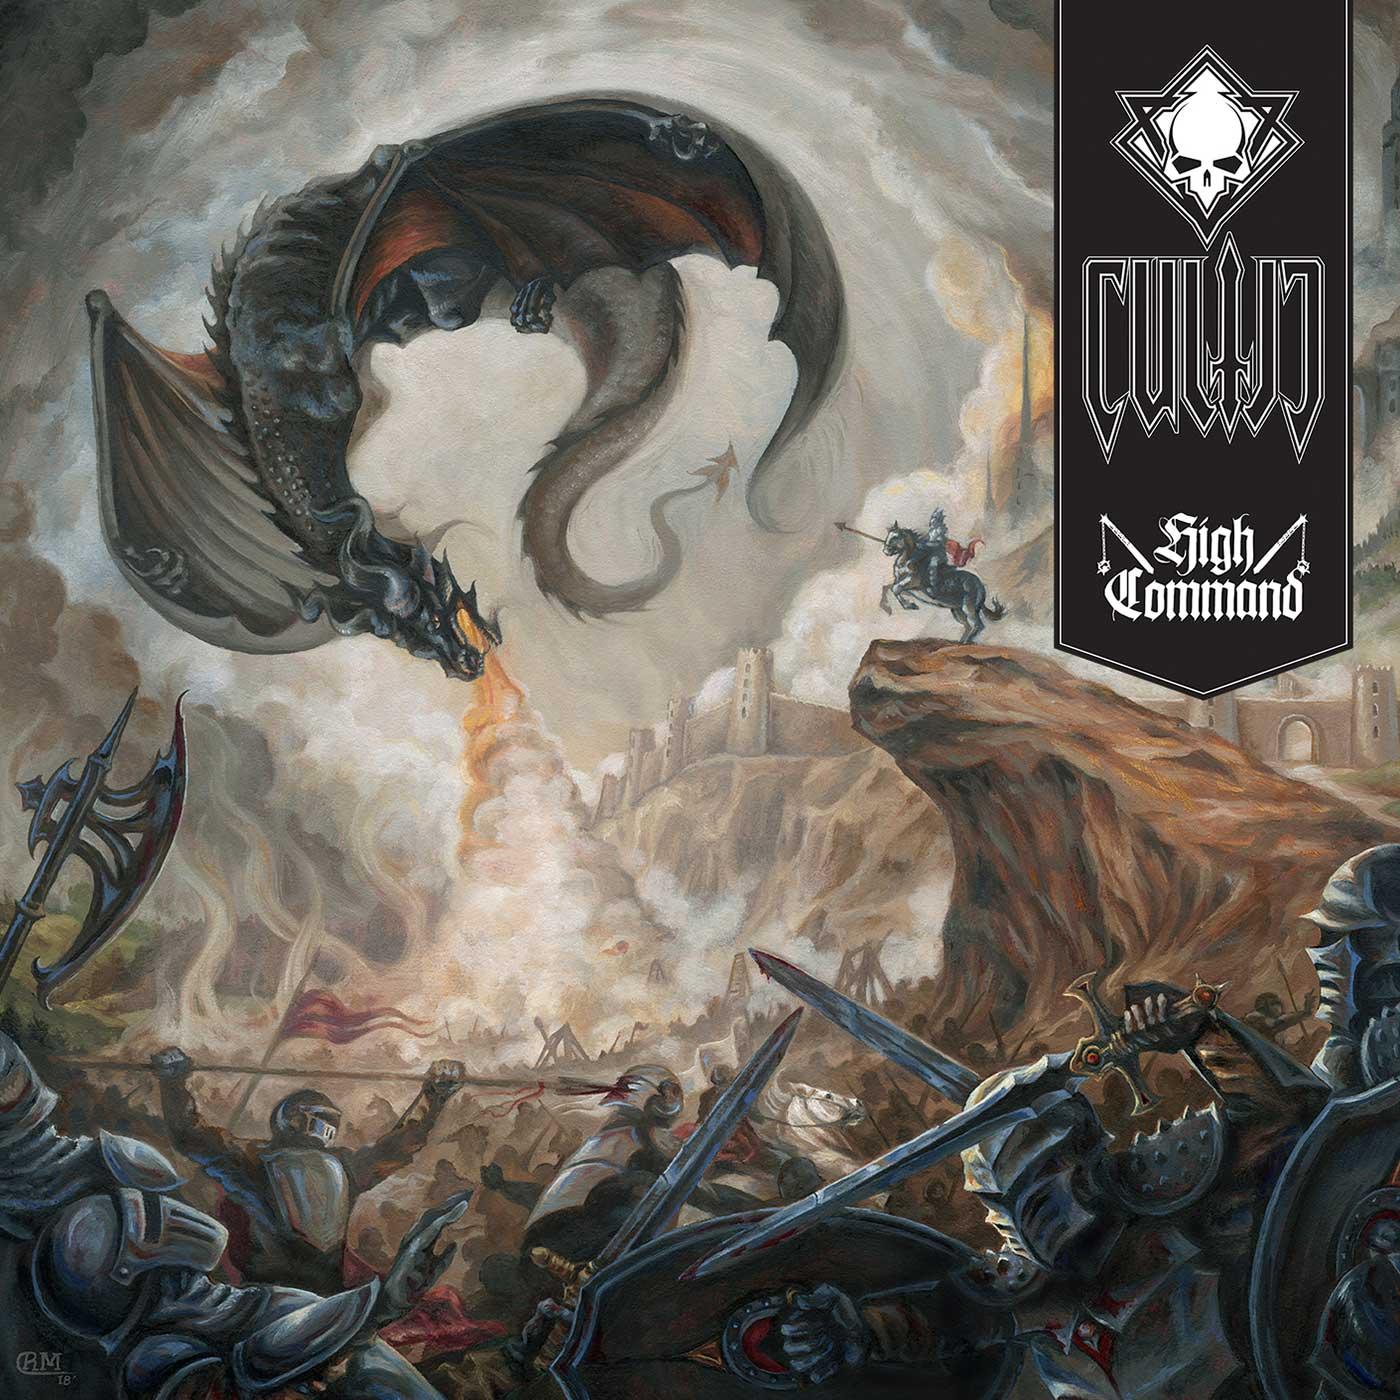 Cultic - High Command CD-R